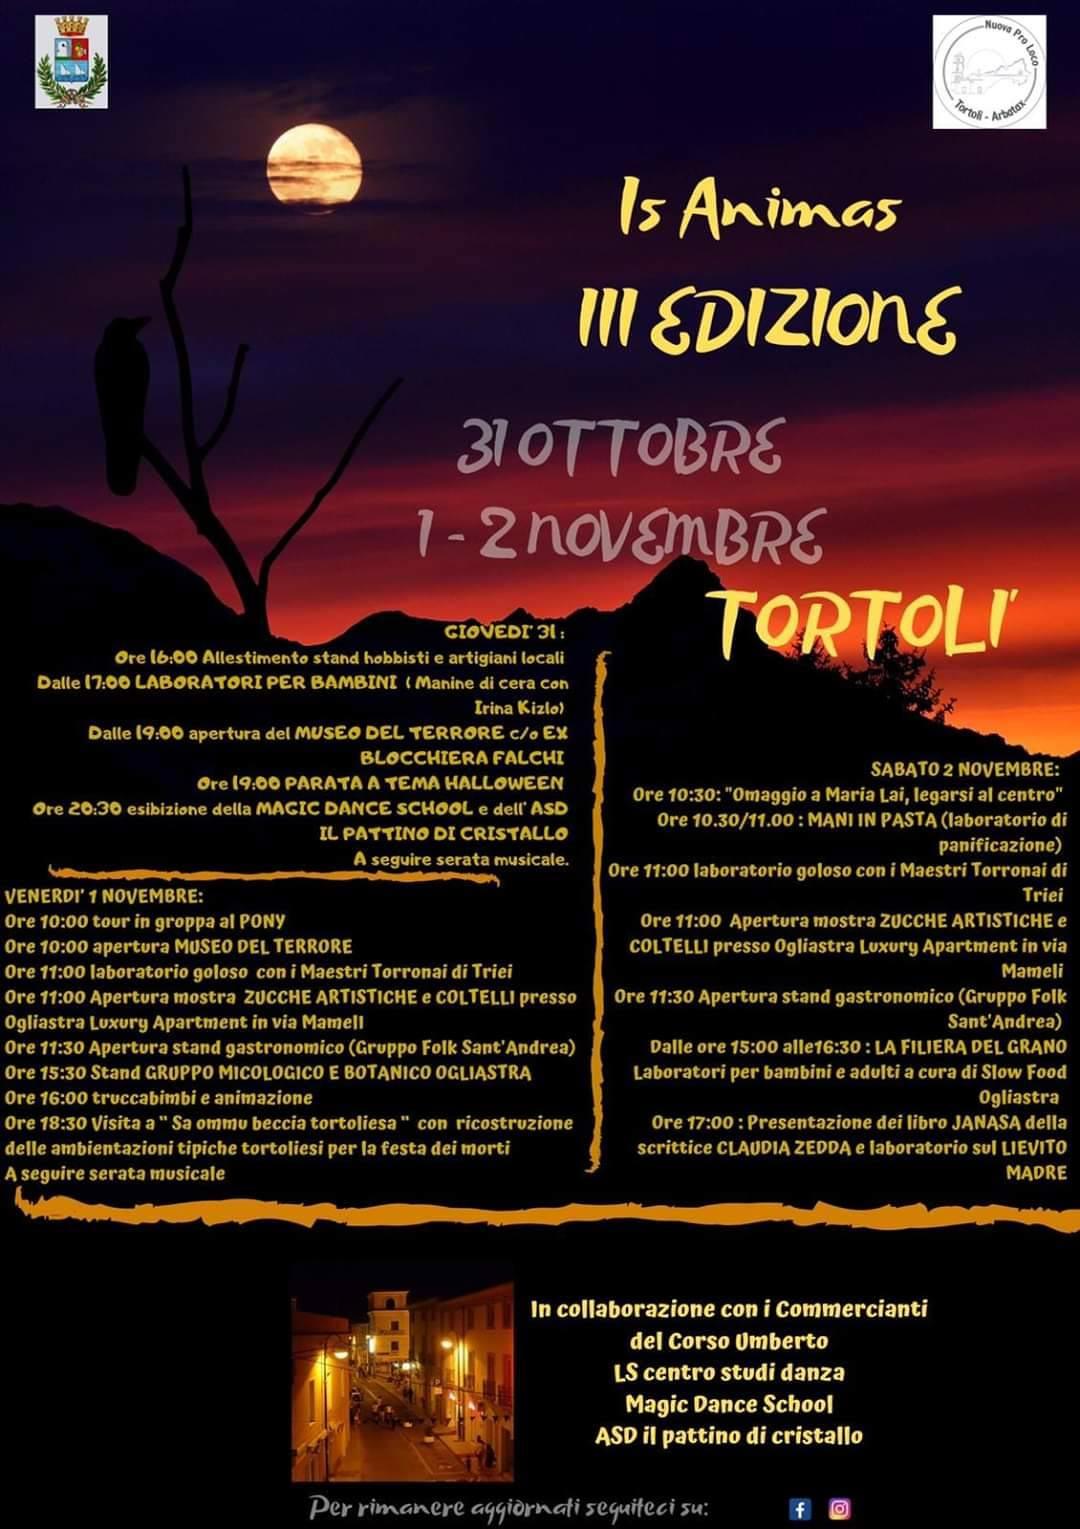 is_animas_tortoli_programma